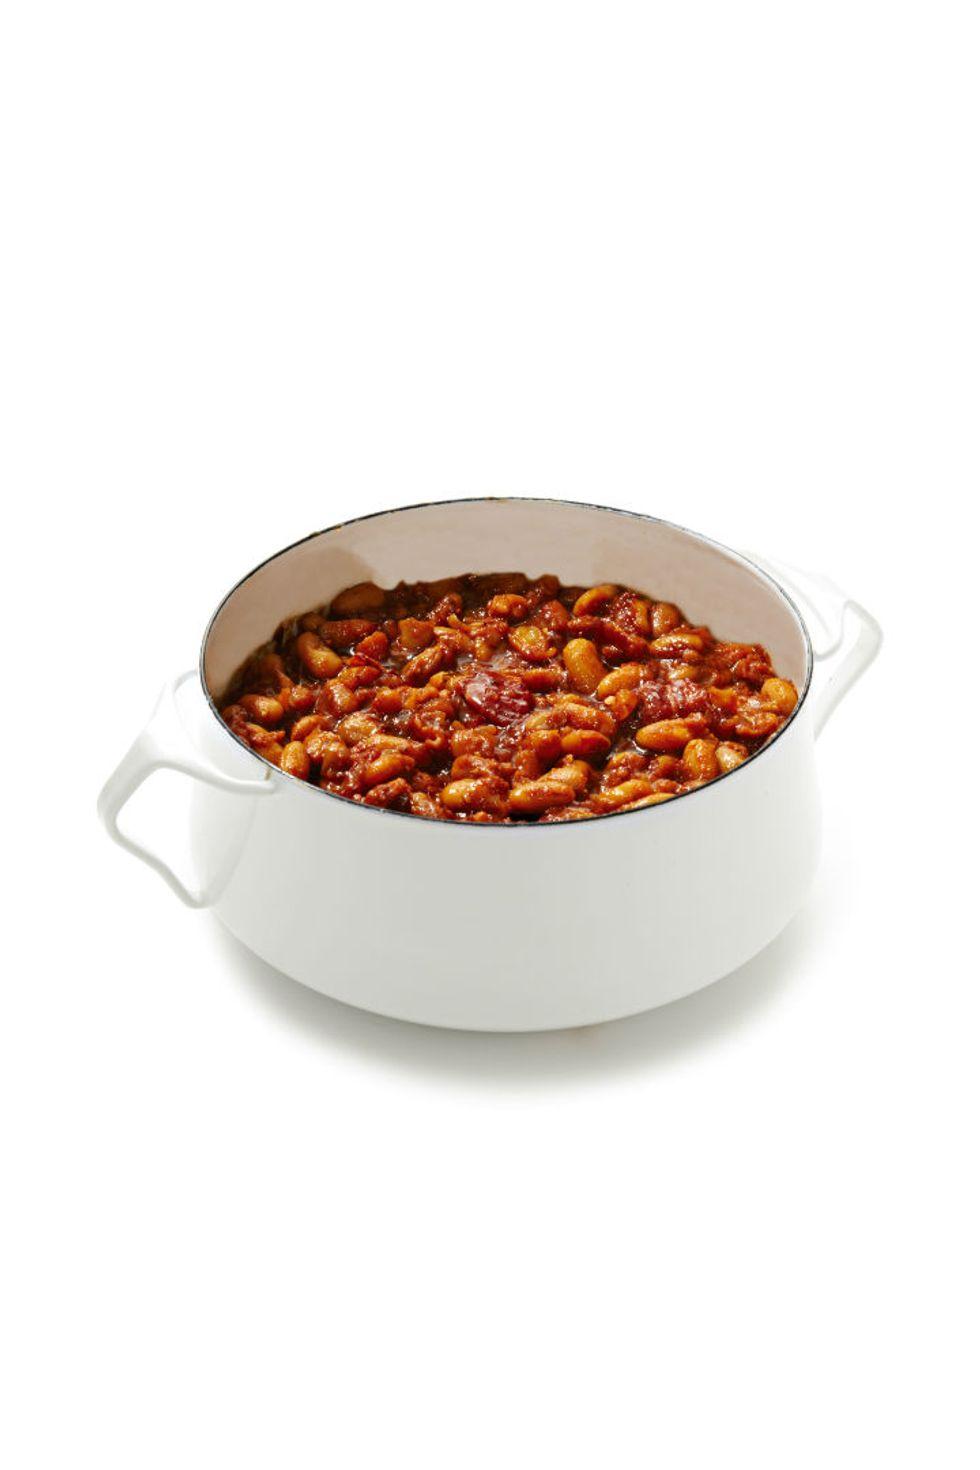 Vegetarian Chili With Brown Rice